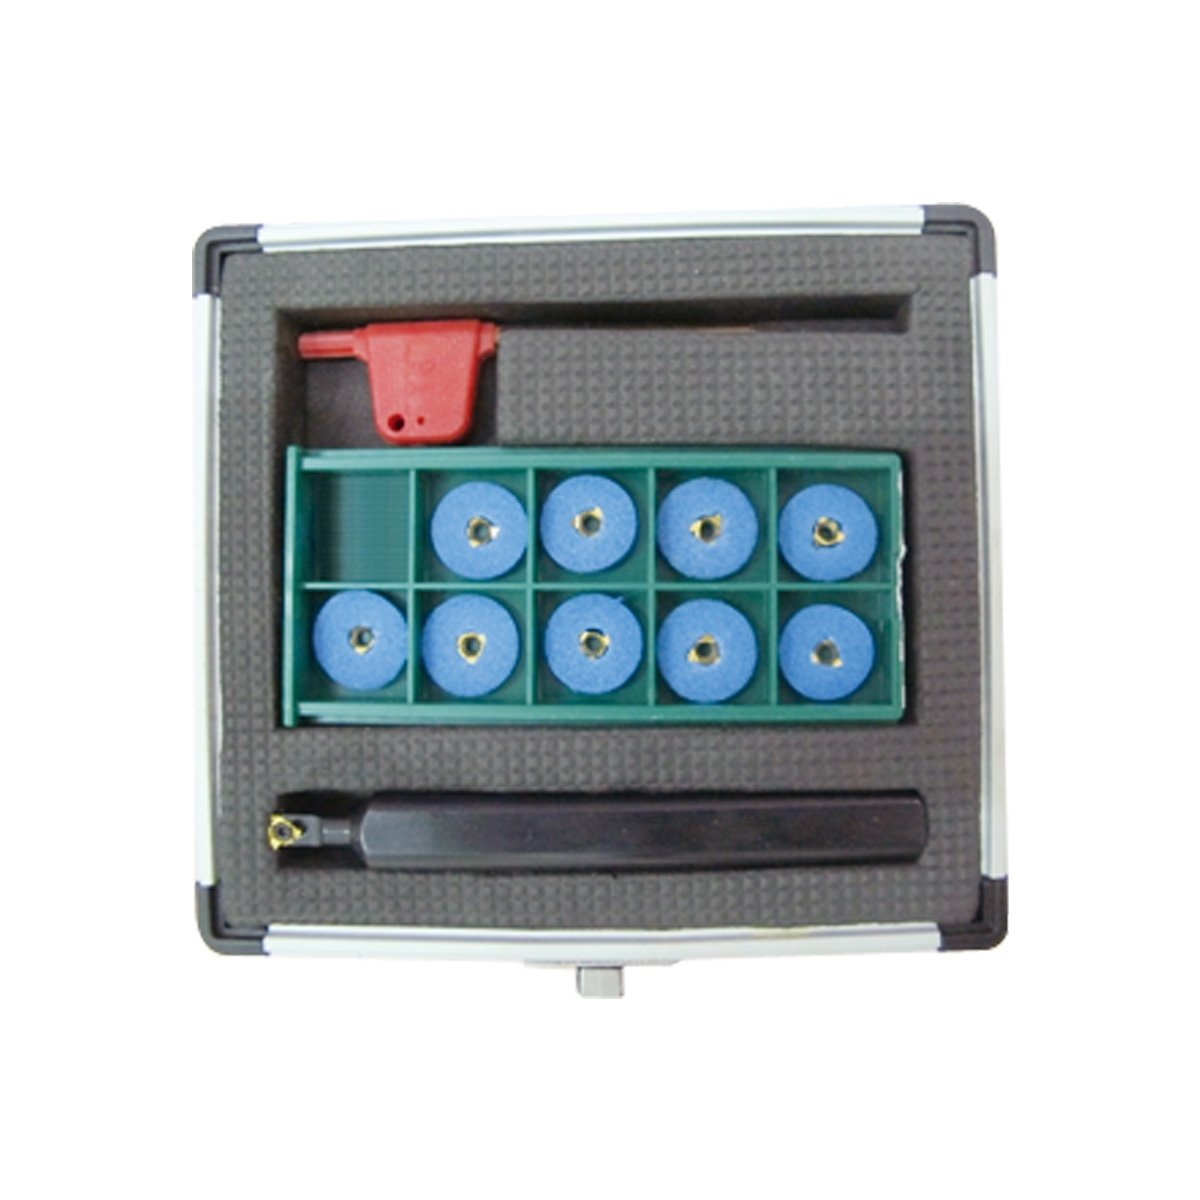 HHIP 2305-0625 5/8 x .830 x 5'' Mini Index able Threading Tool Holder Kit